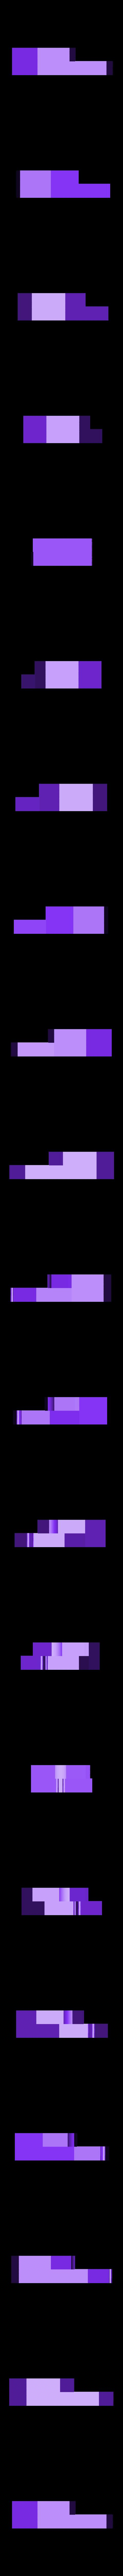 wall_mounting_tab.stl Download free STL file Modular Hex Drawers • Design to 3D print, O3D